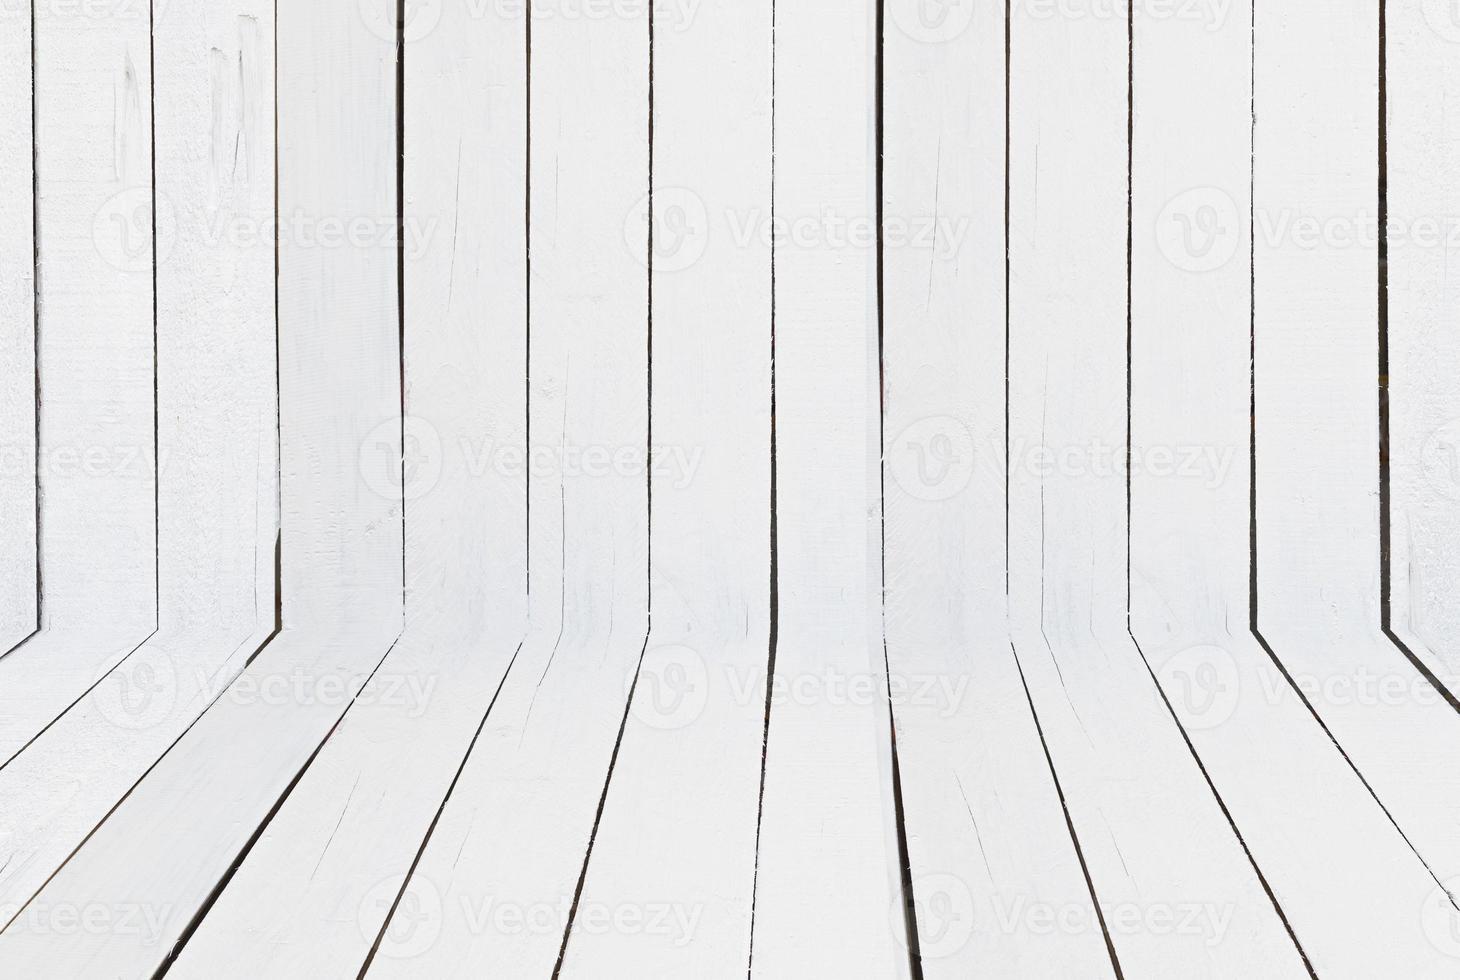 Fondo de pared de textura de madera blanca vieja foto